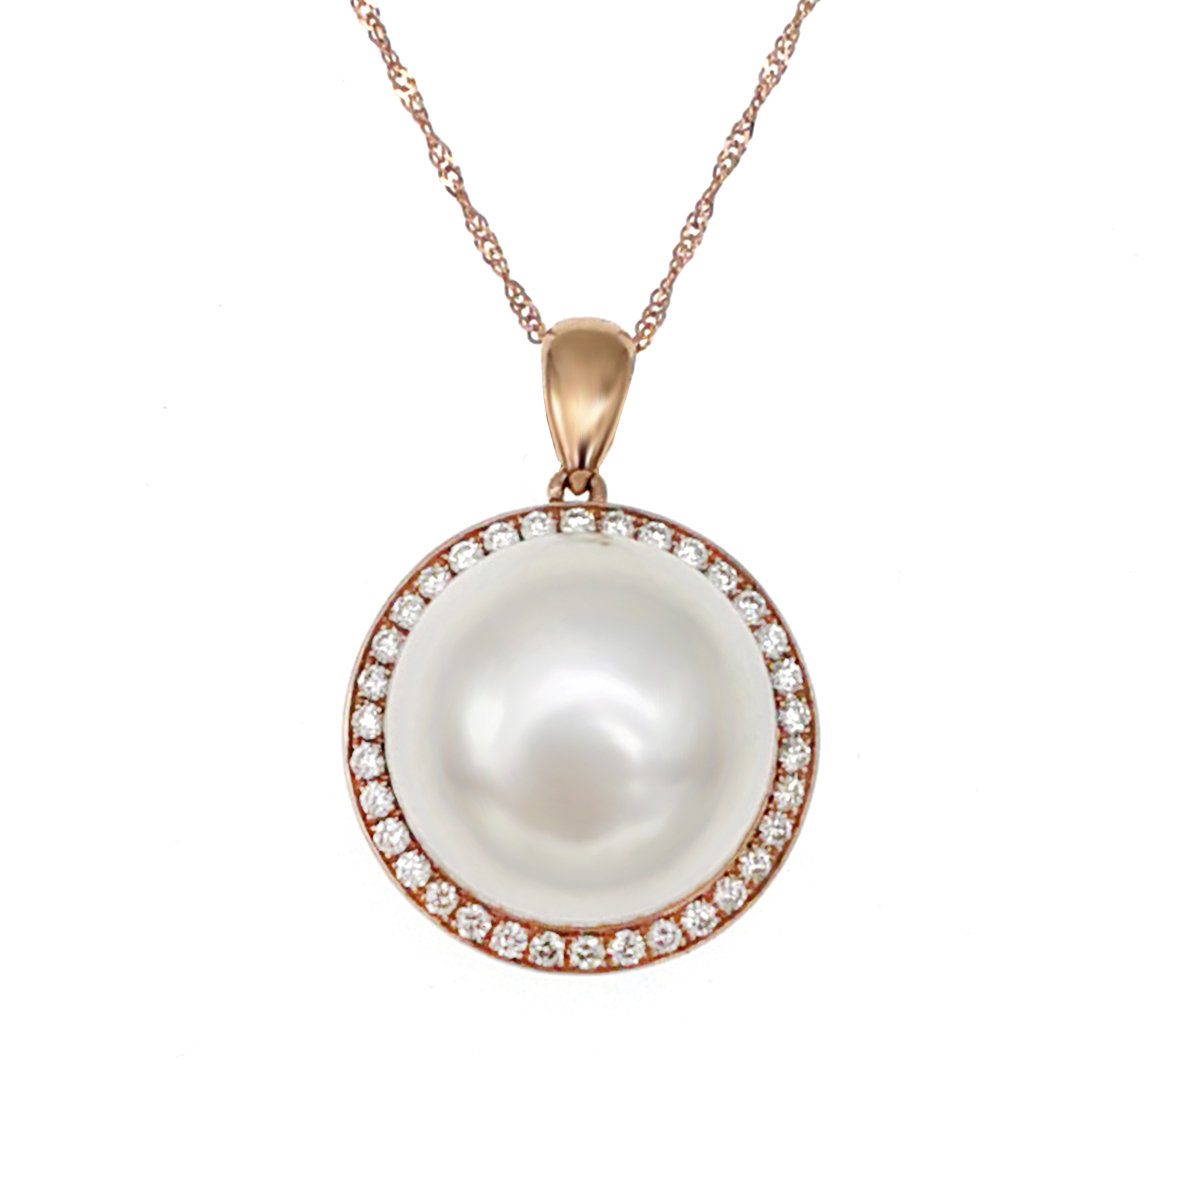 14K/585 玫瑰金鑲天然鑽石淡水養殖珍珠銀吊墜連頸鍊